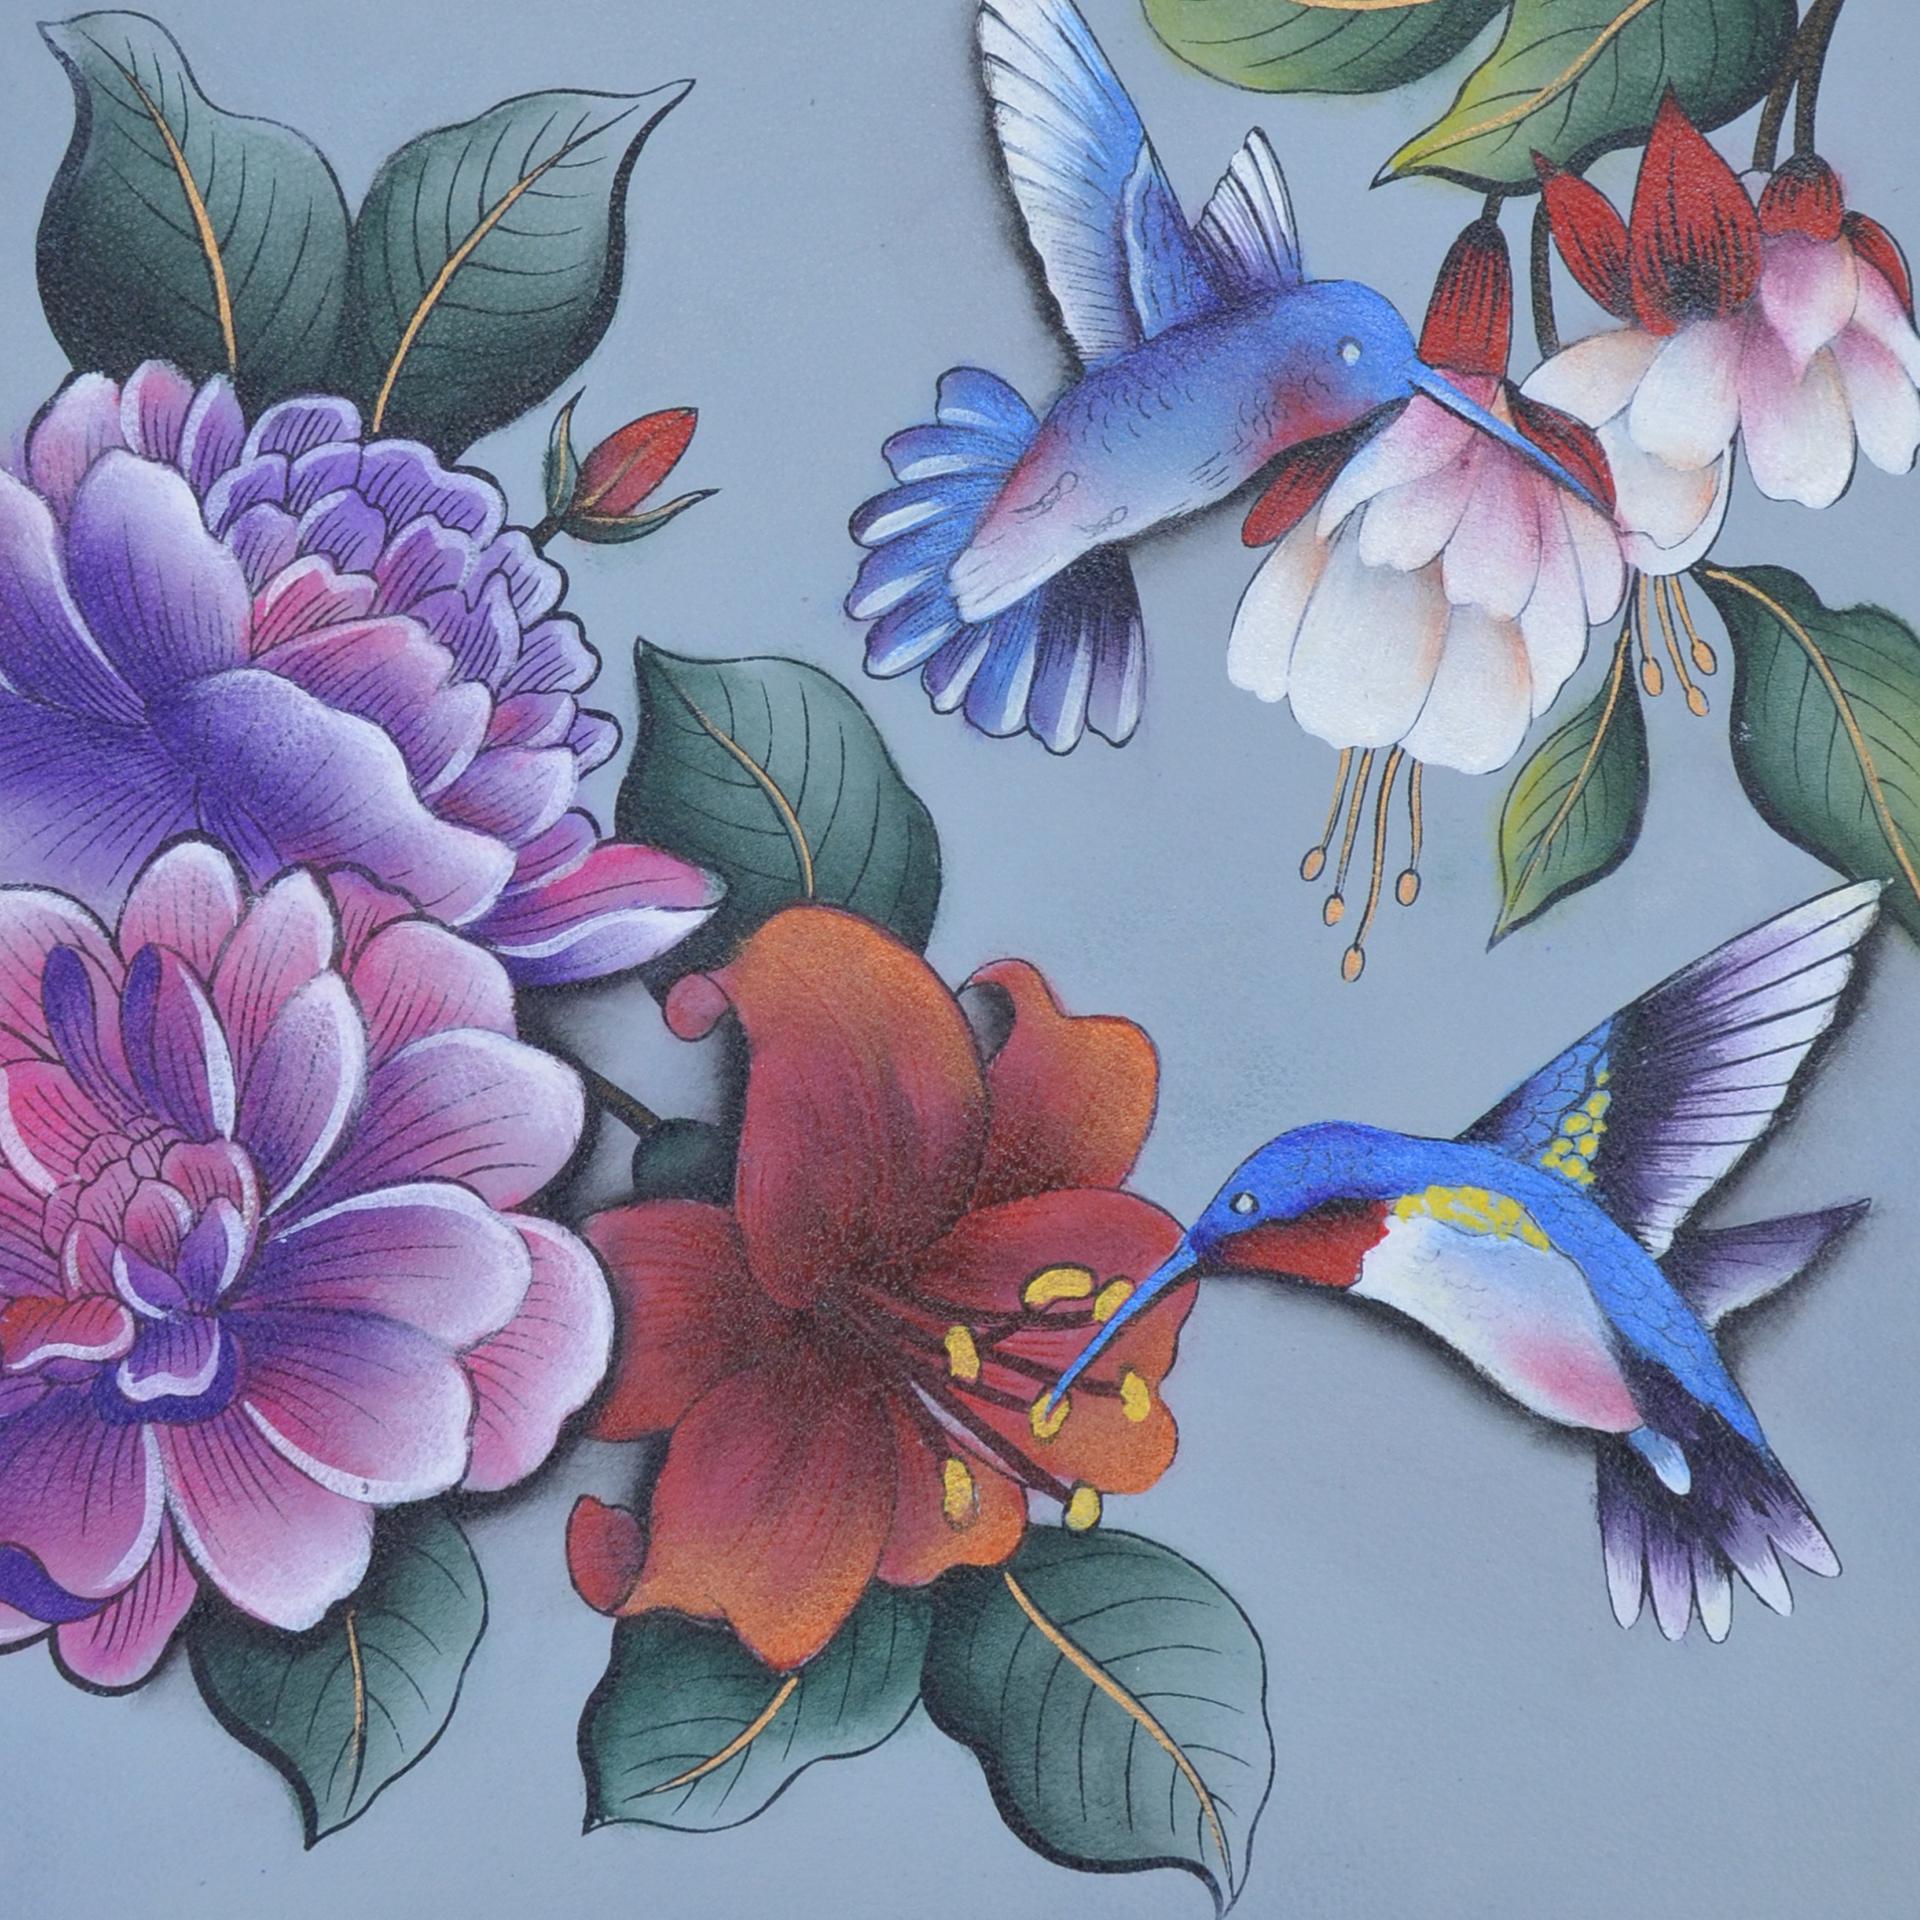 Birds, Flowers